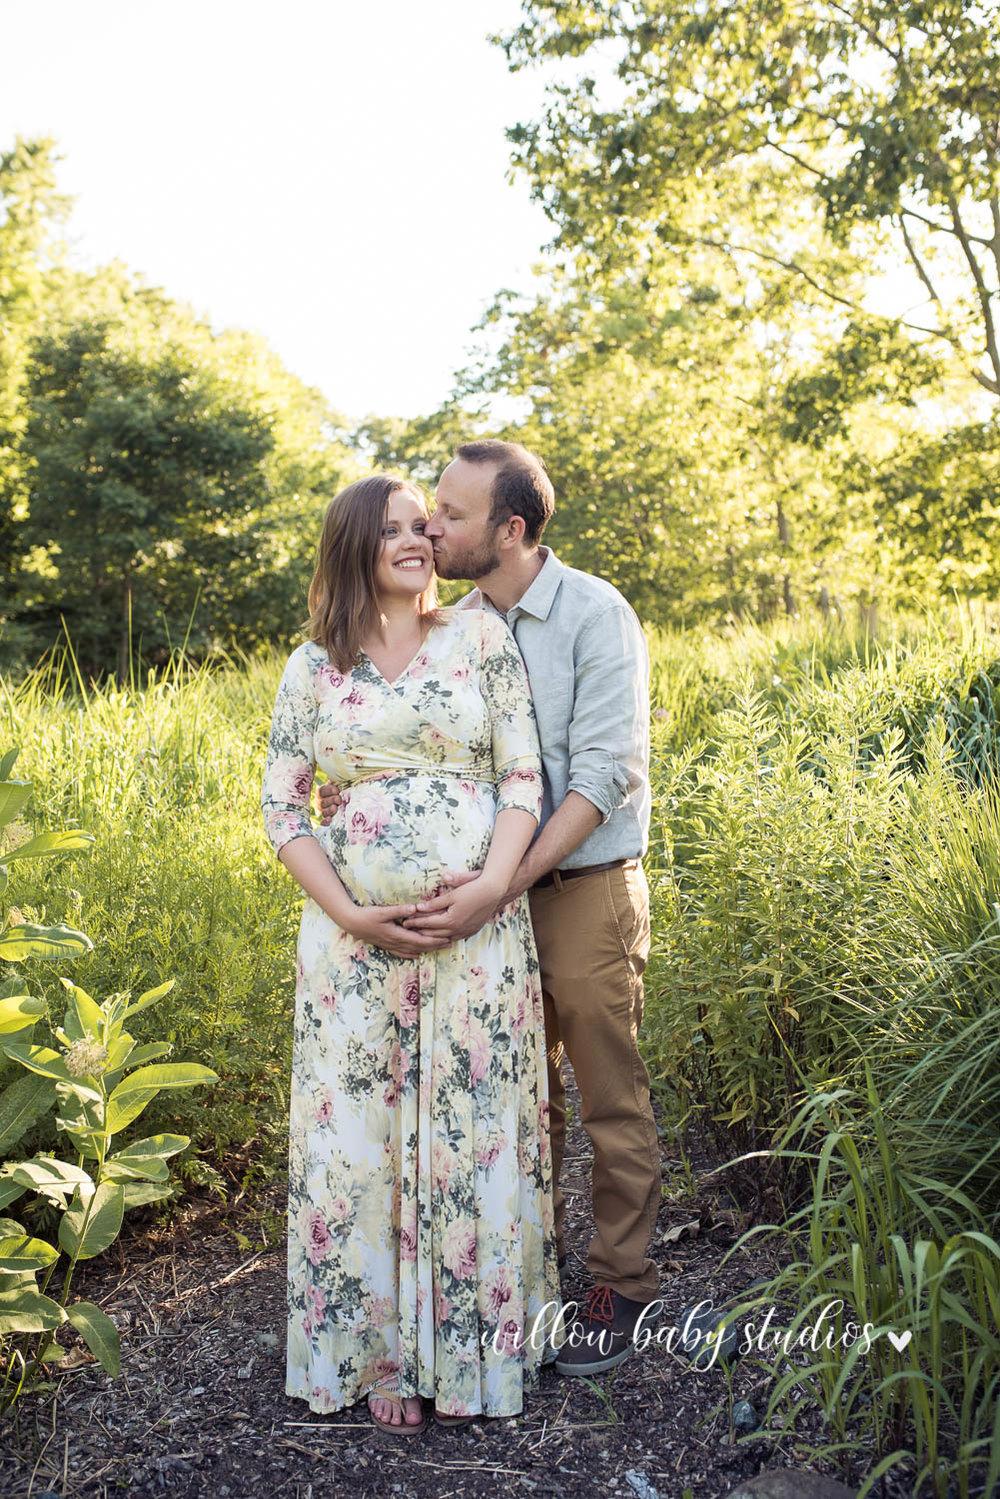 cambridge-ma-maternity-photography-5.jpg